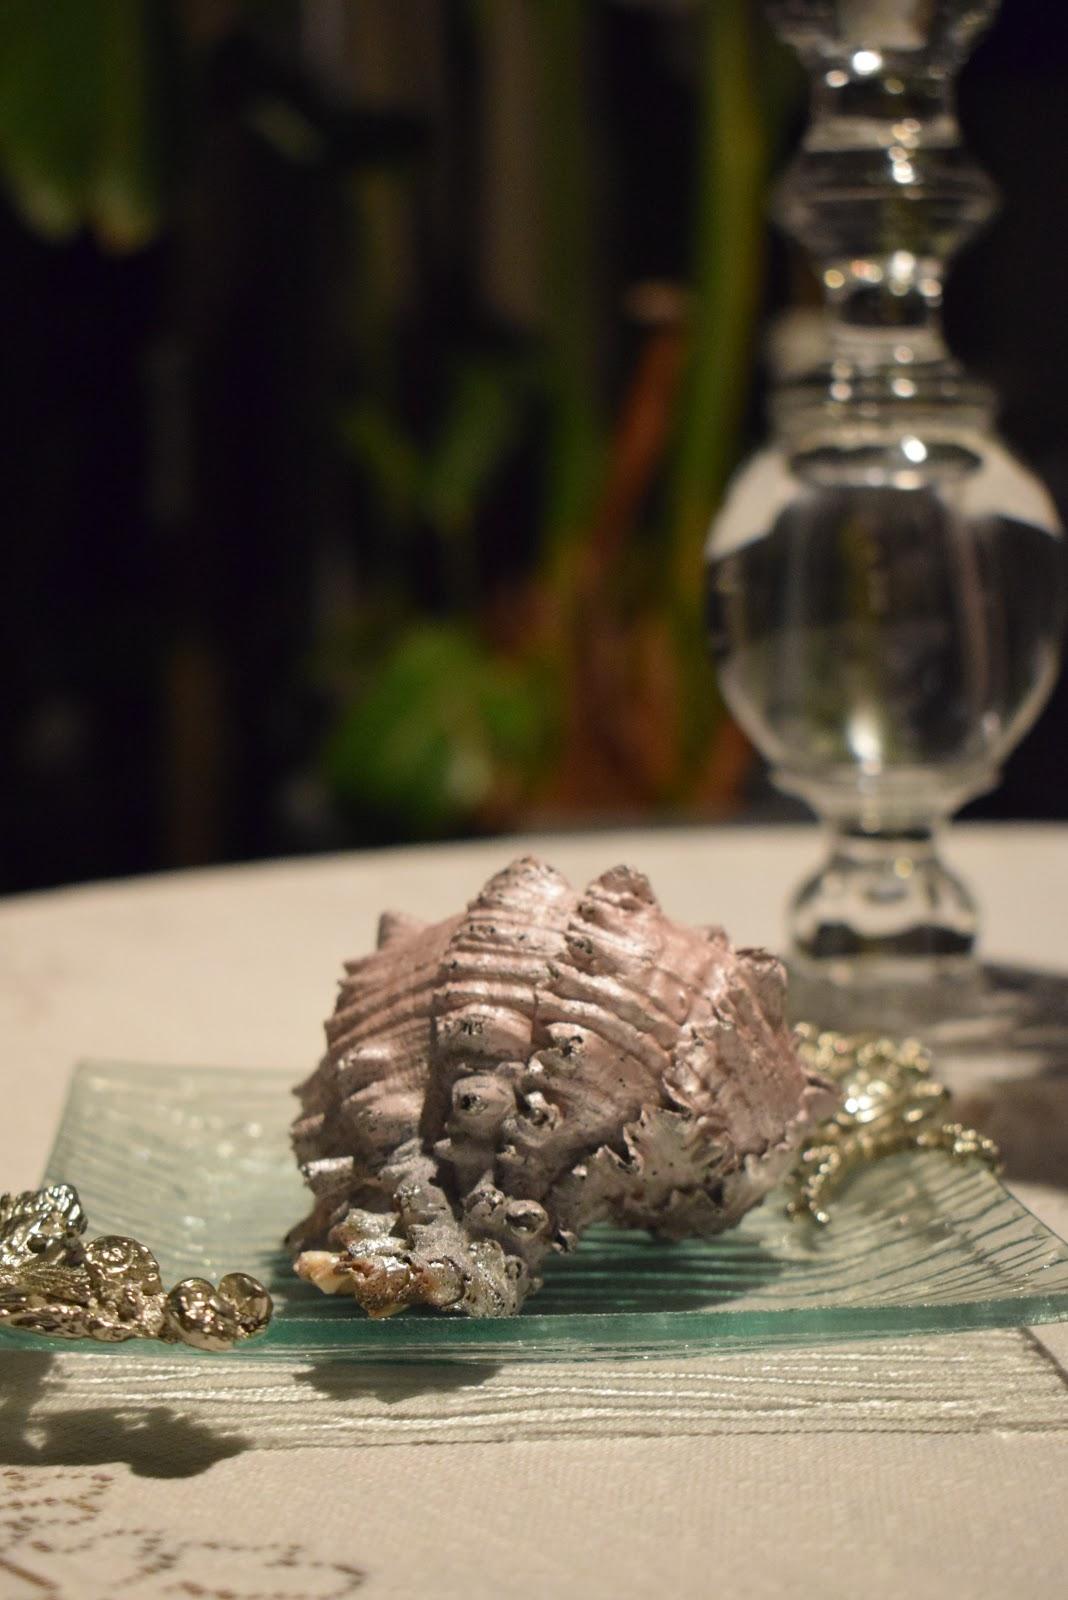 Patio, Table Cloth & Decor; Seashells